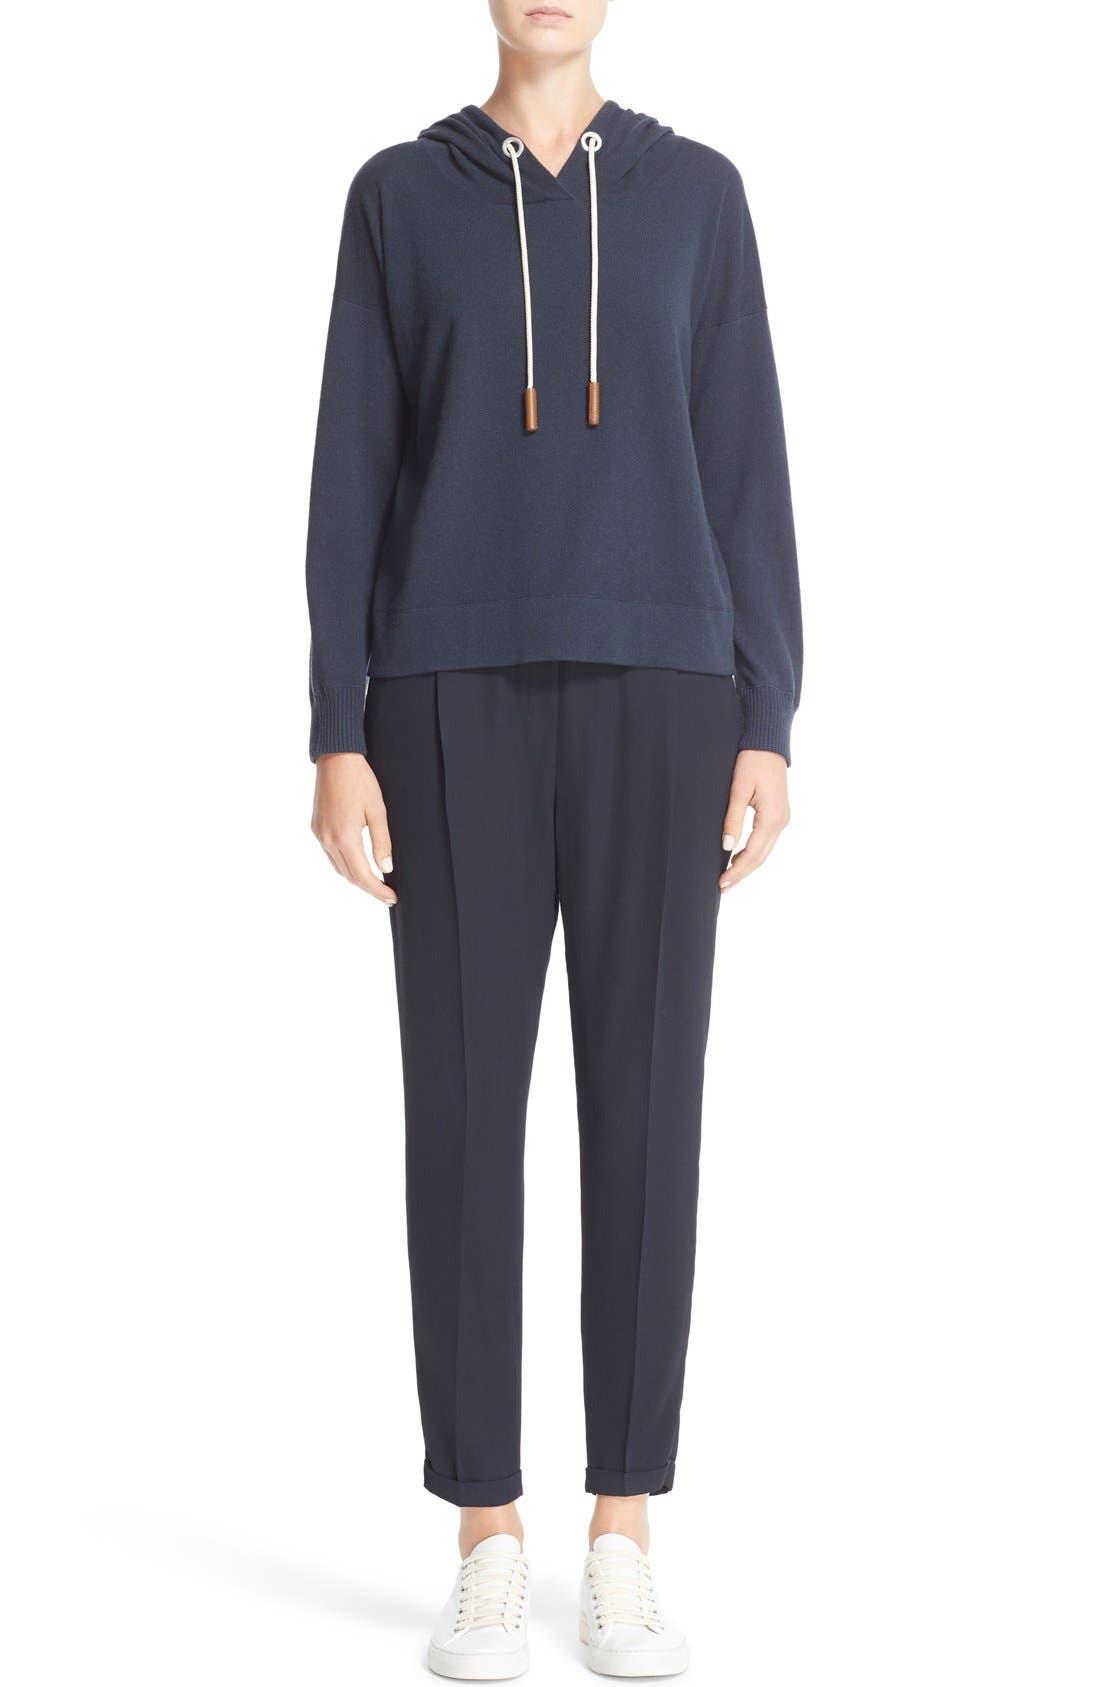 Cashmere Hooded Sweatshirt,                             Alternate thumbnail 7, color,                             Slate Blue